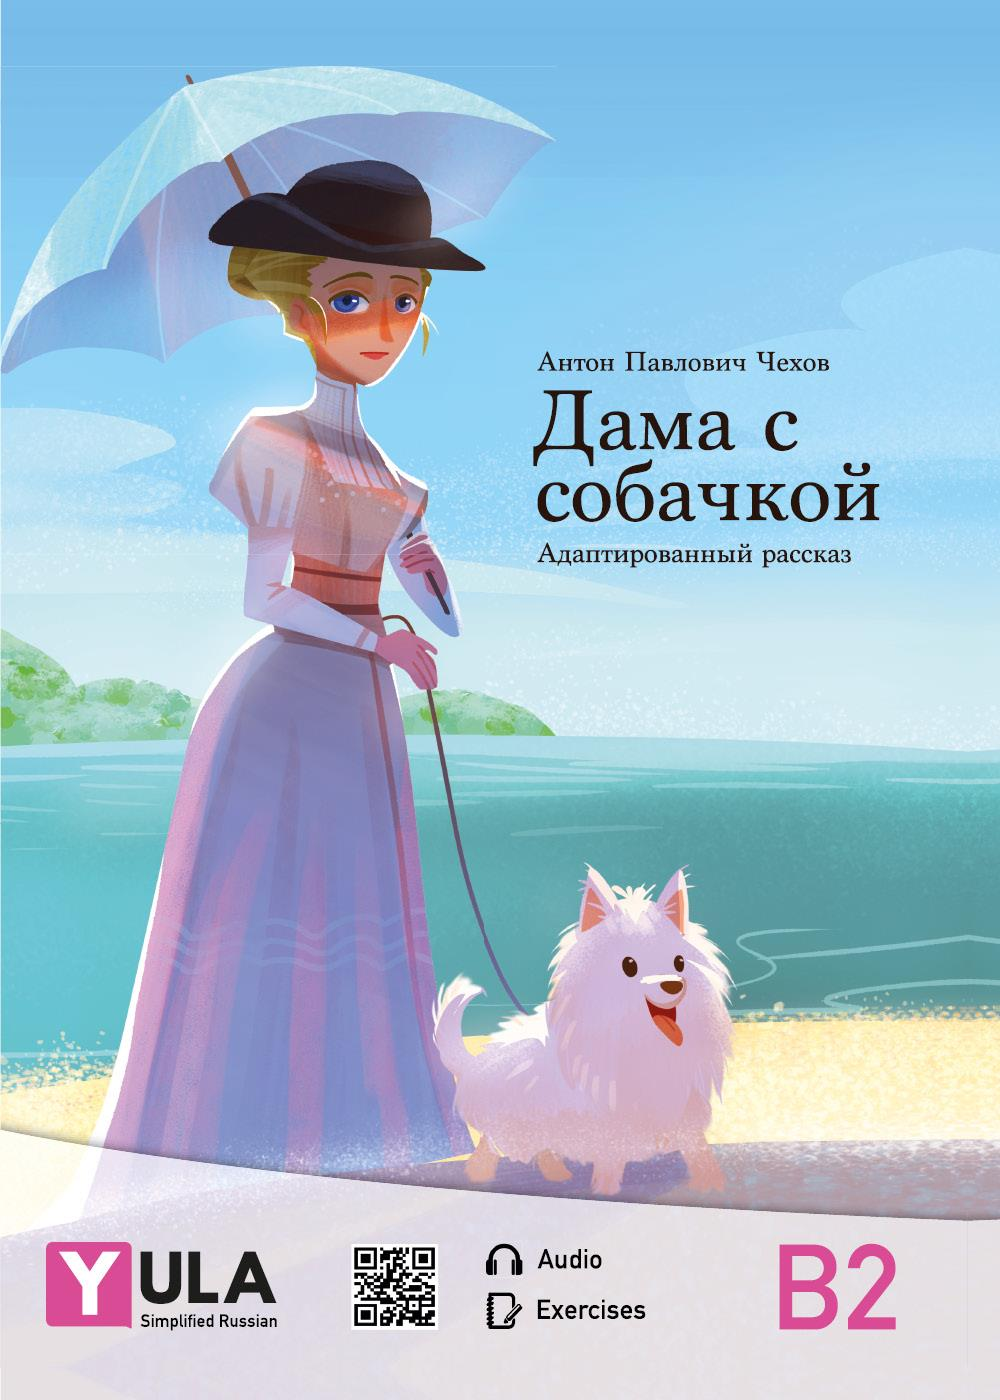 Дама с собачкой - адаптированный рассказ | Dama con cagnolino - russo semplificato | Lady with the Dog - simplified Russian